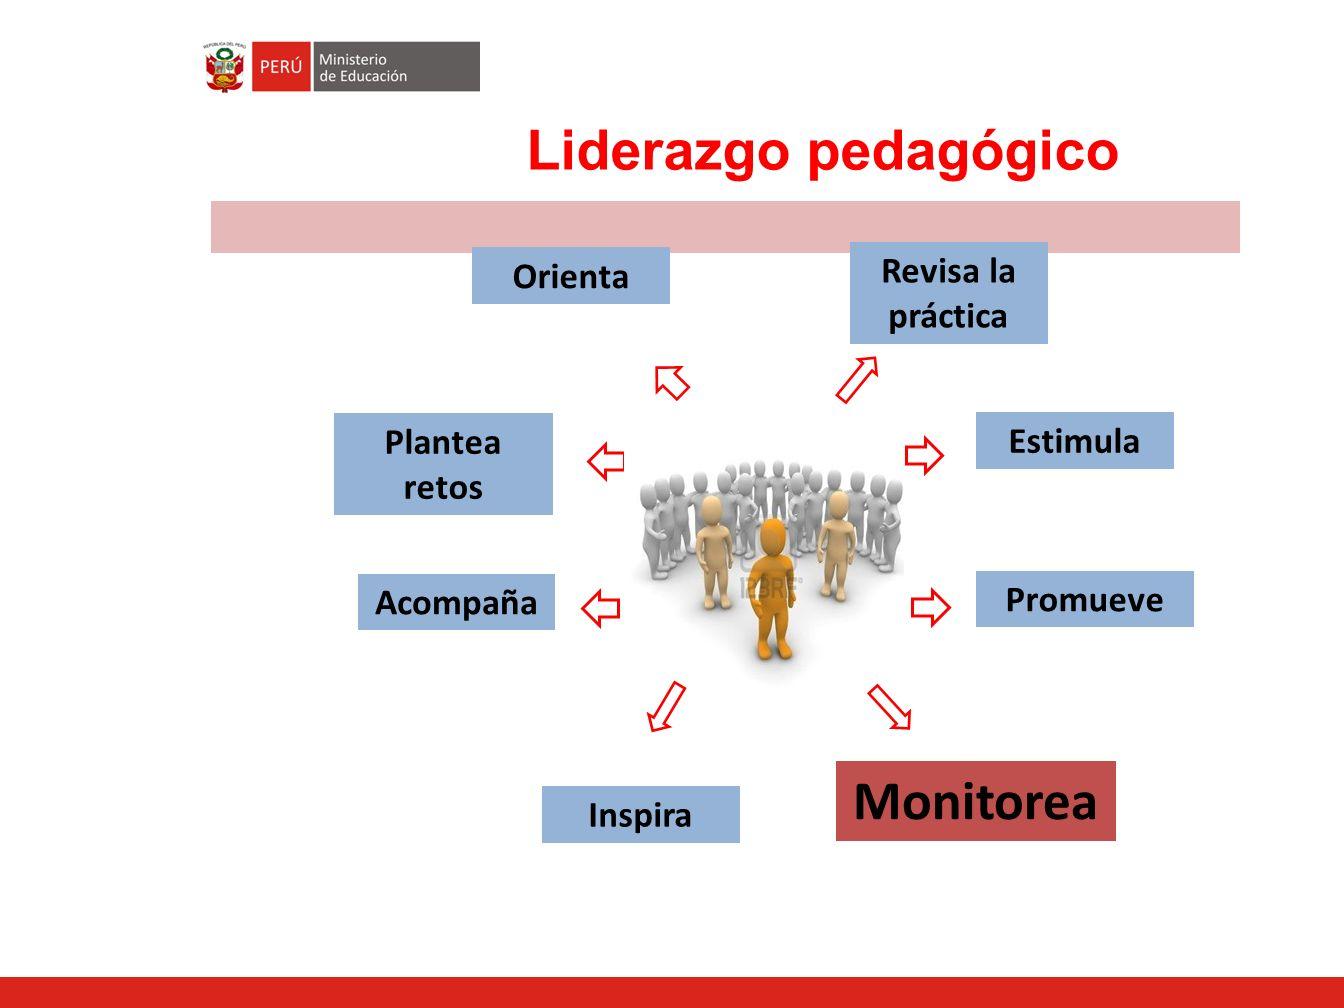 Liderazgo pedagógico Monitorea Revisa la práctica Orienta